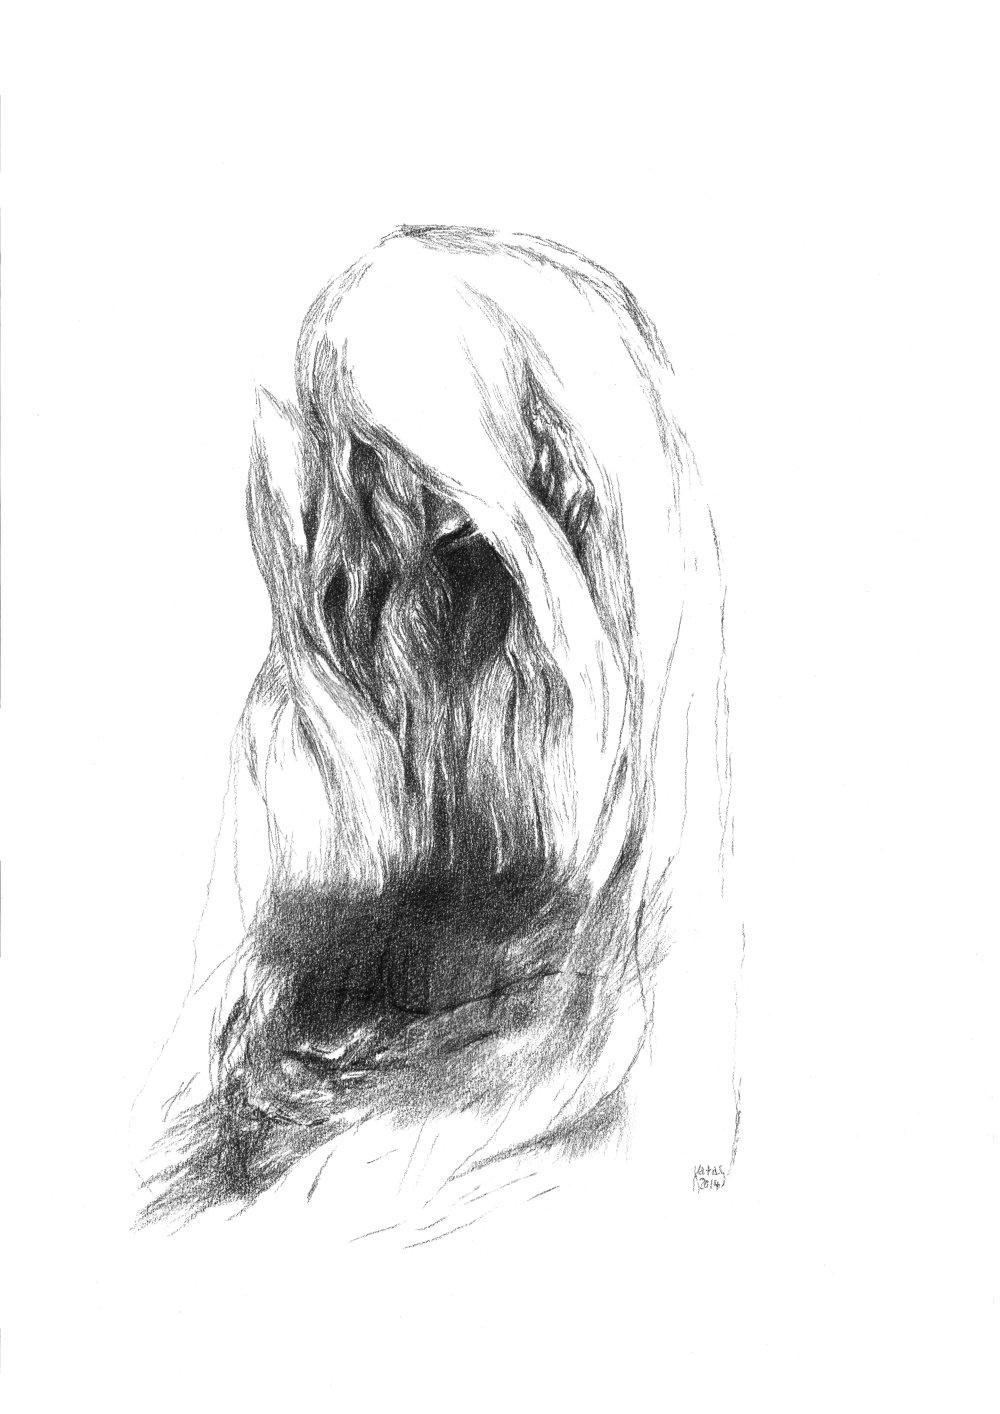 Krehká, 2014, kresba uhľom, 240x297mm